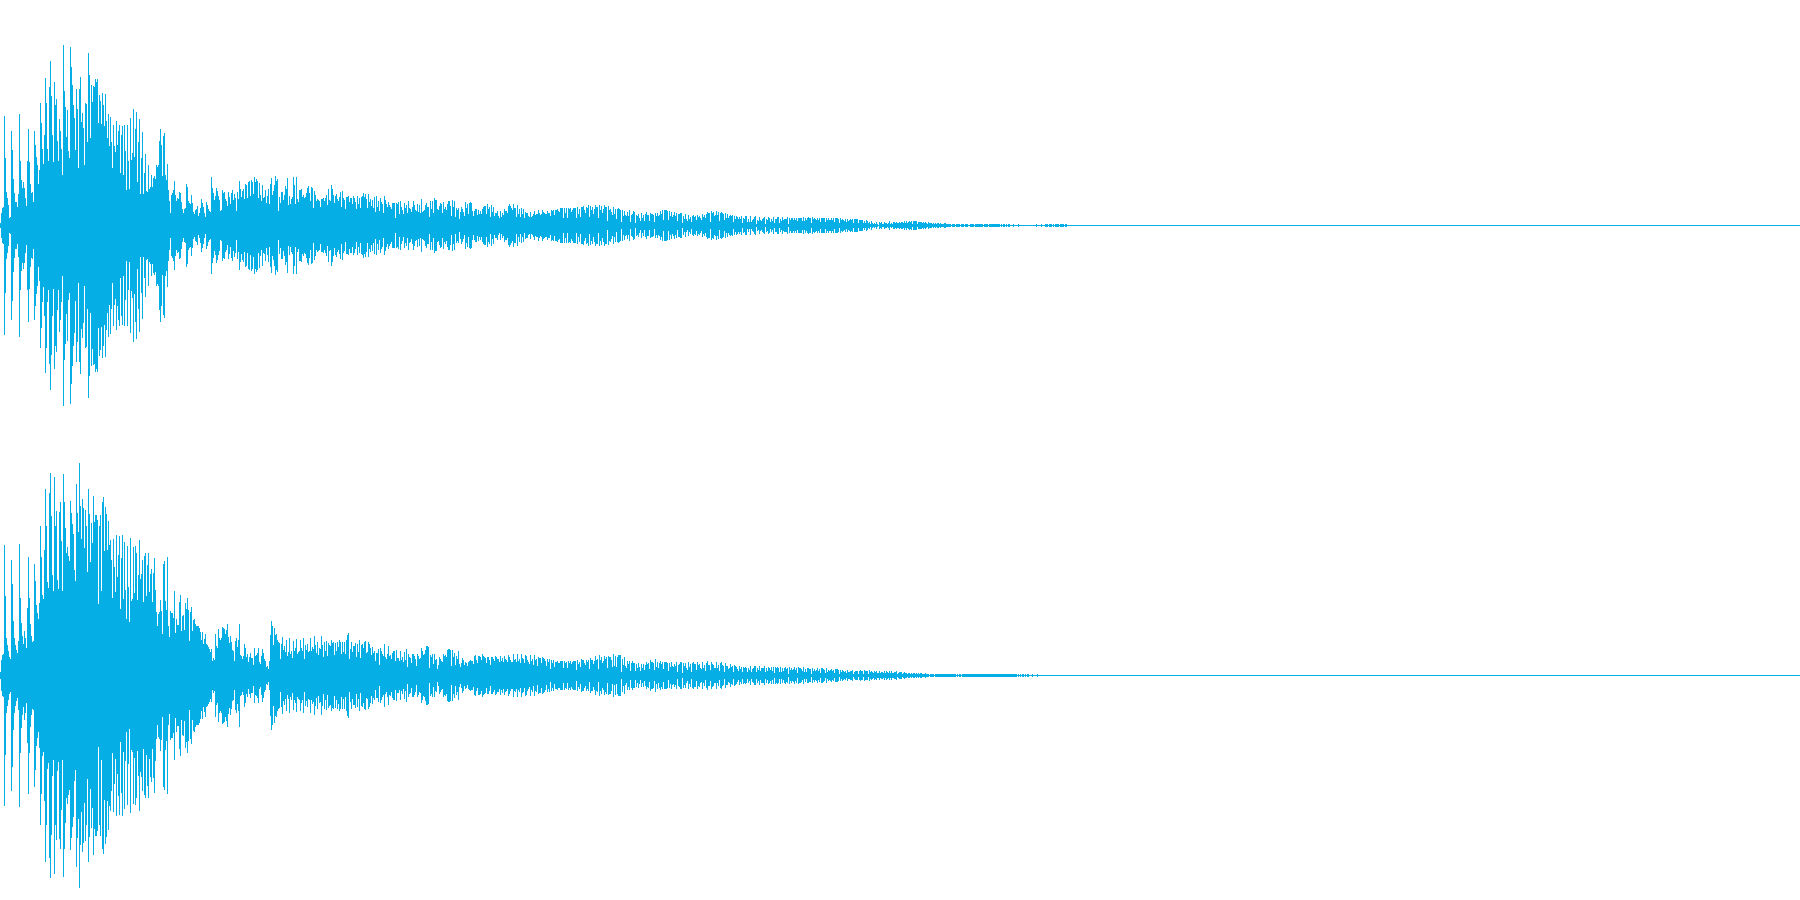 Zako ゲームのザコキャラの鳴き声 1の再生済みの波形